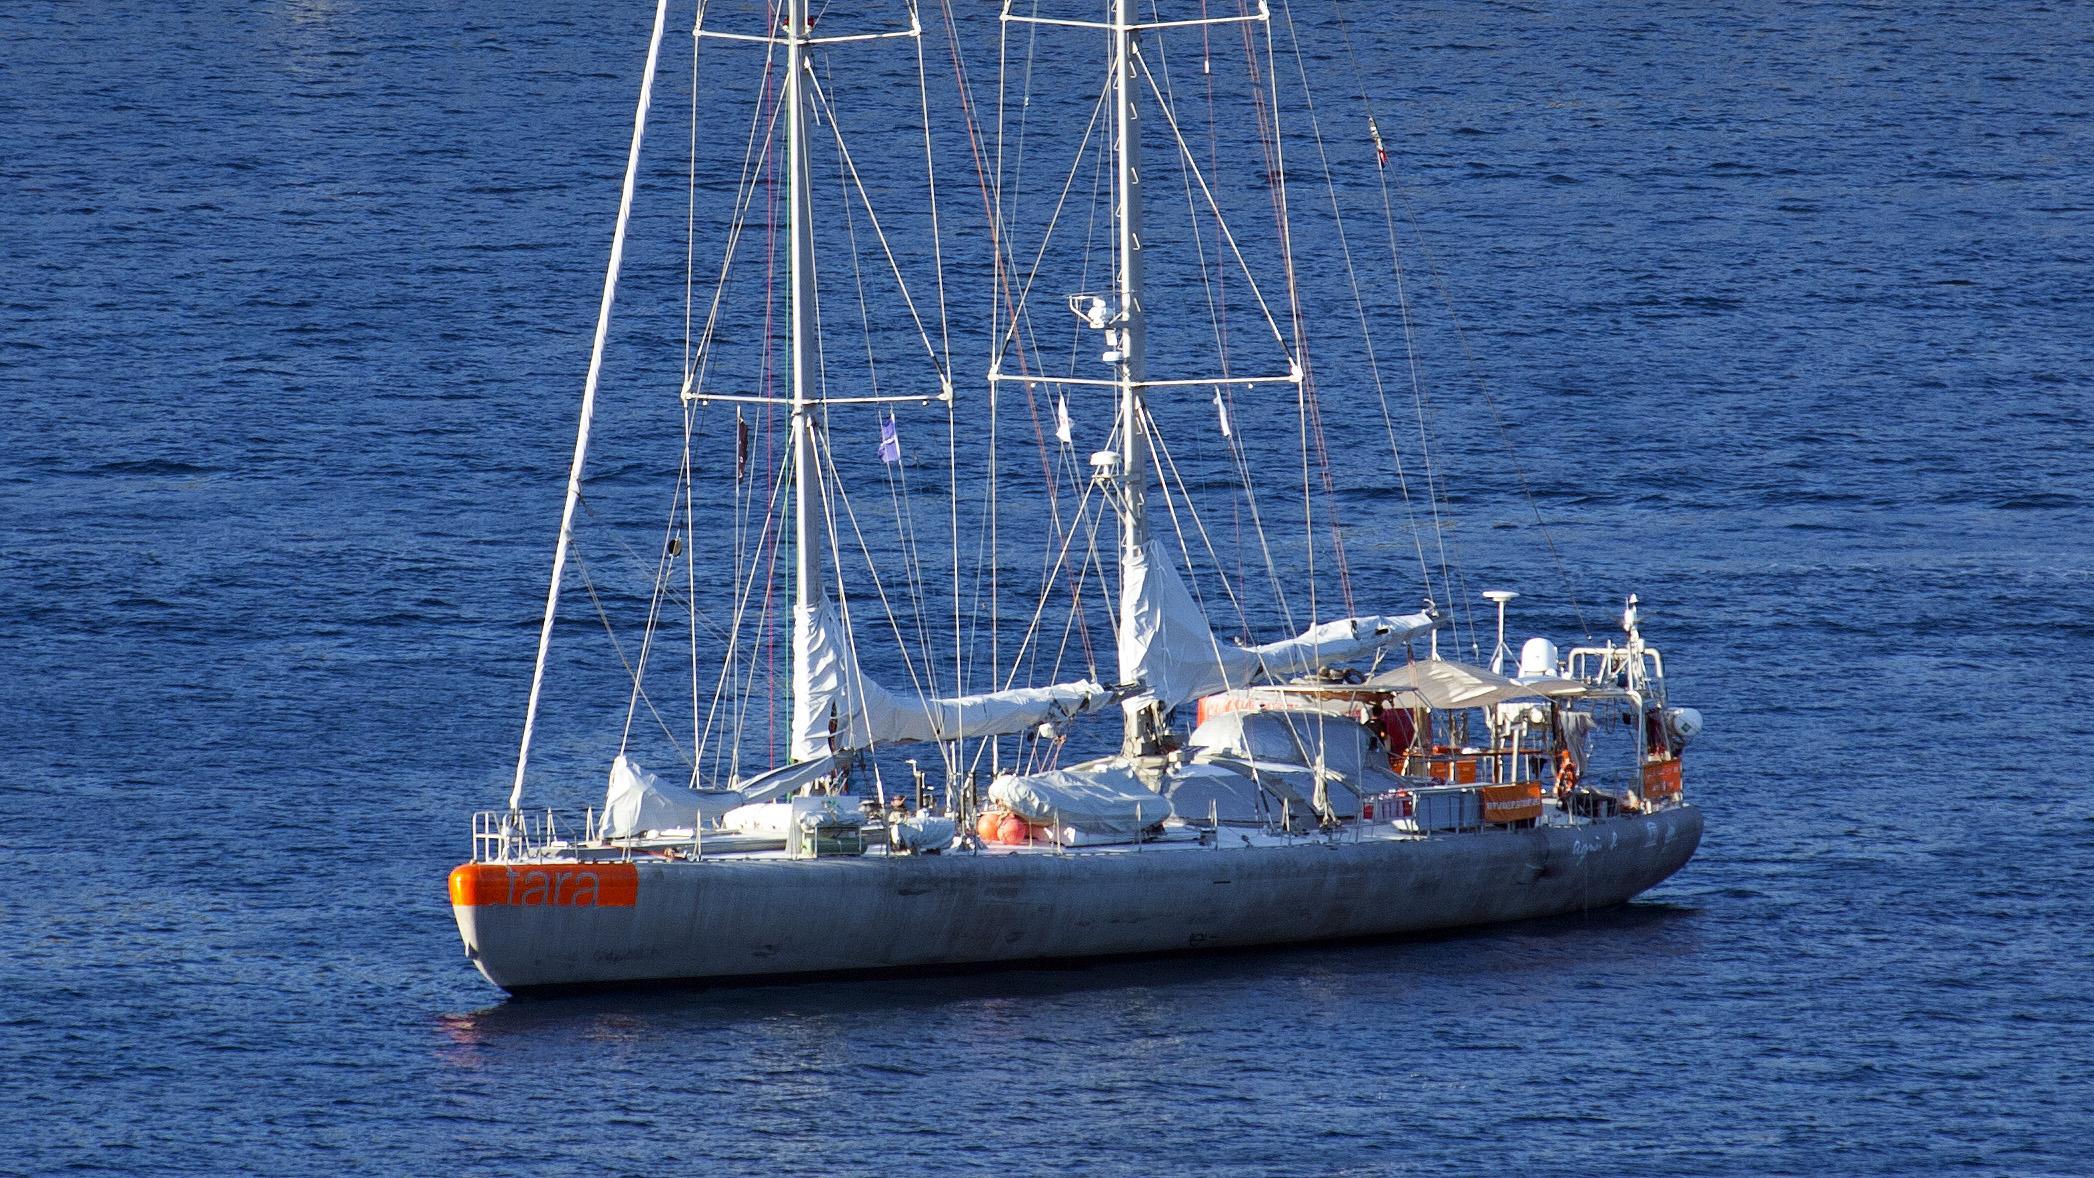 tara-half-sailing-yacht-sfcn-1989-36m-profile